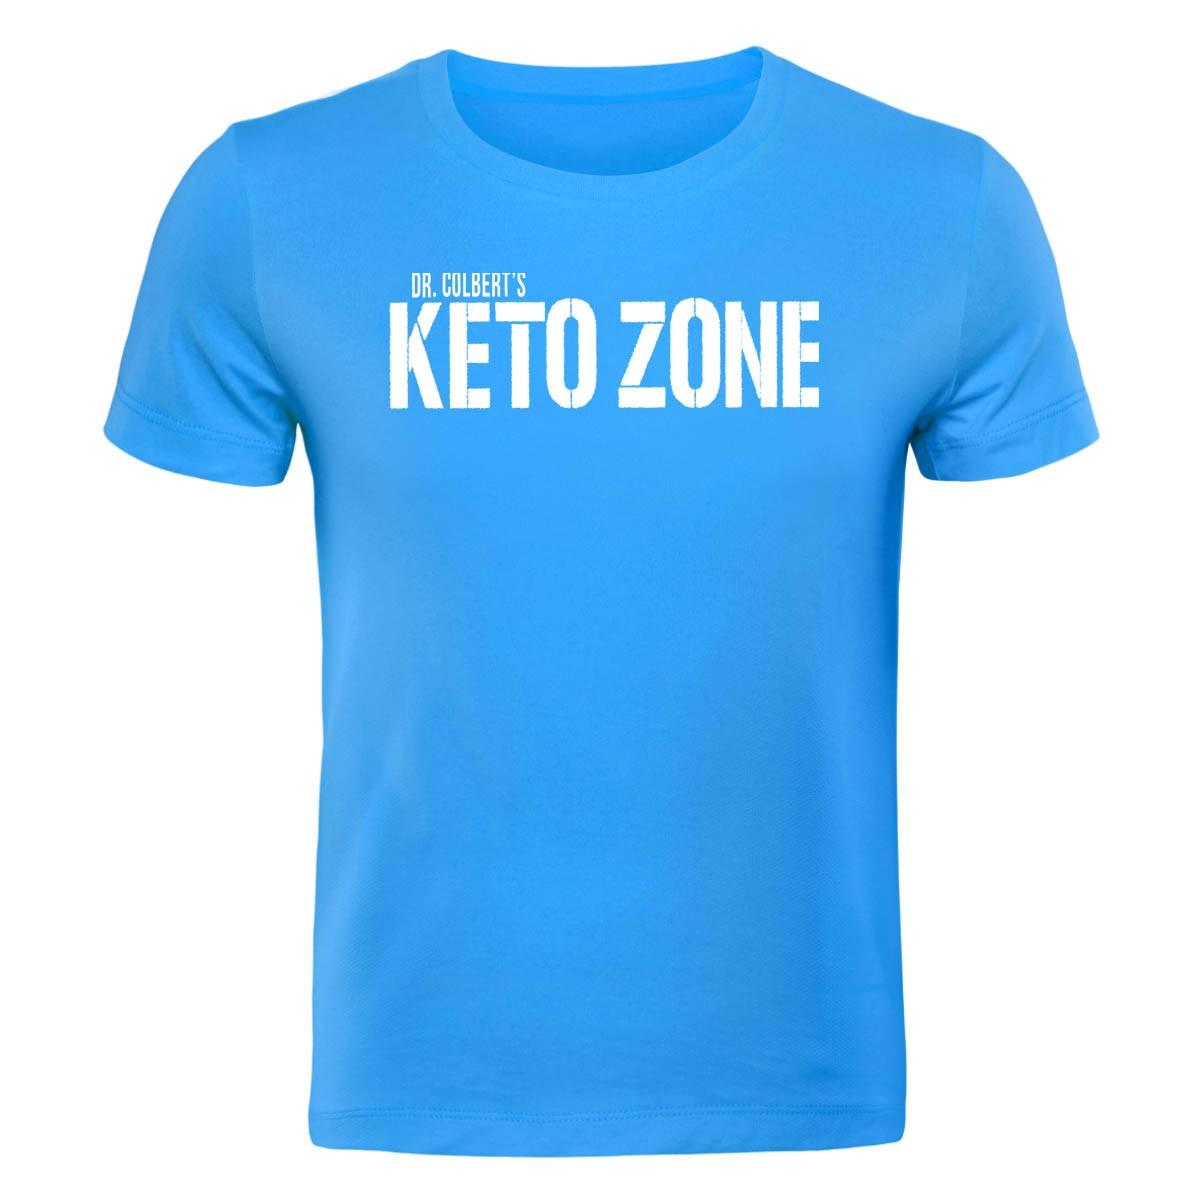 Keto Zone®   Women's XL   Teal  